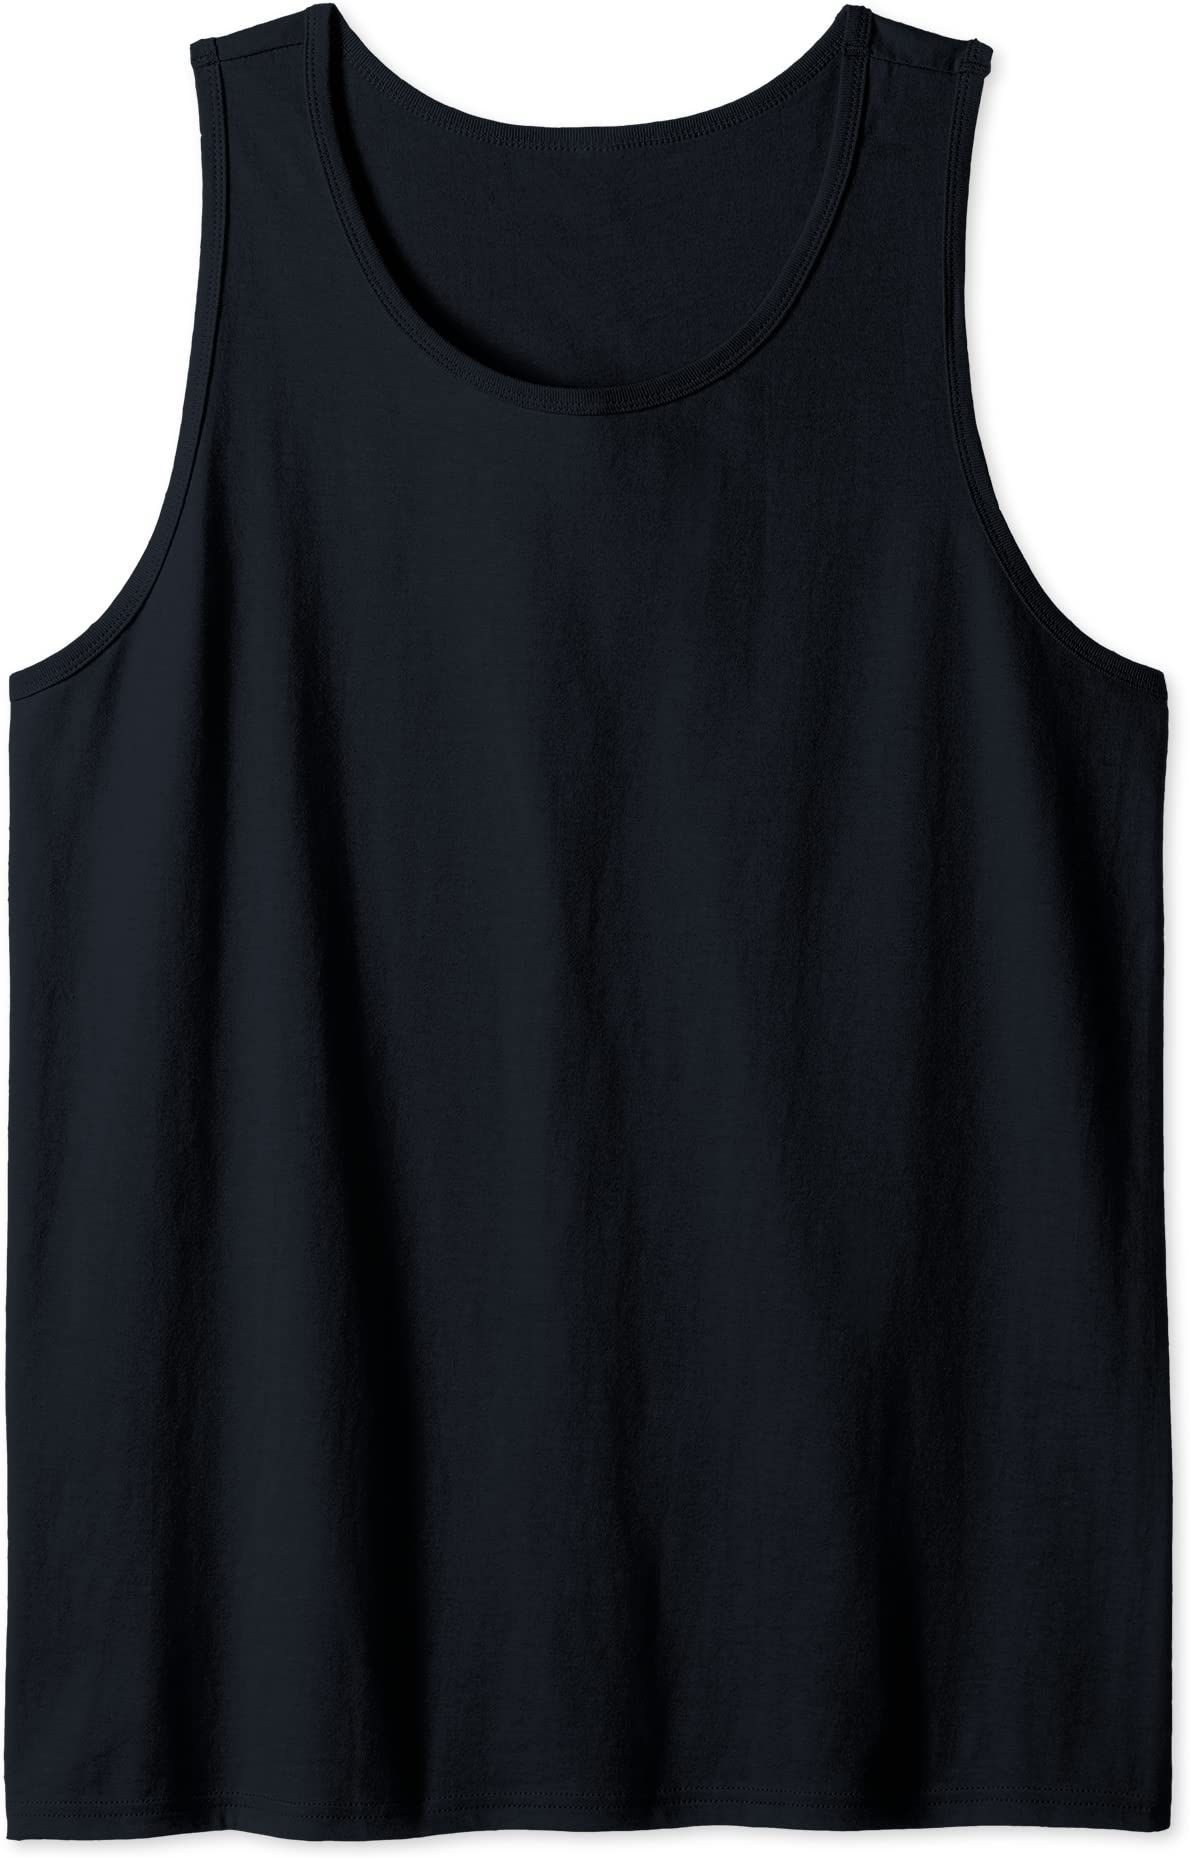 Tank Top Vests S-XXL Size Darth Vader Smoking Funny Mens Ladies Kids T-Shirts